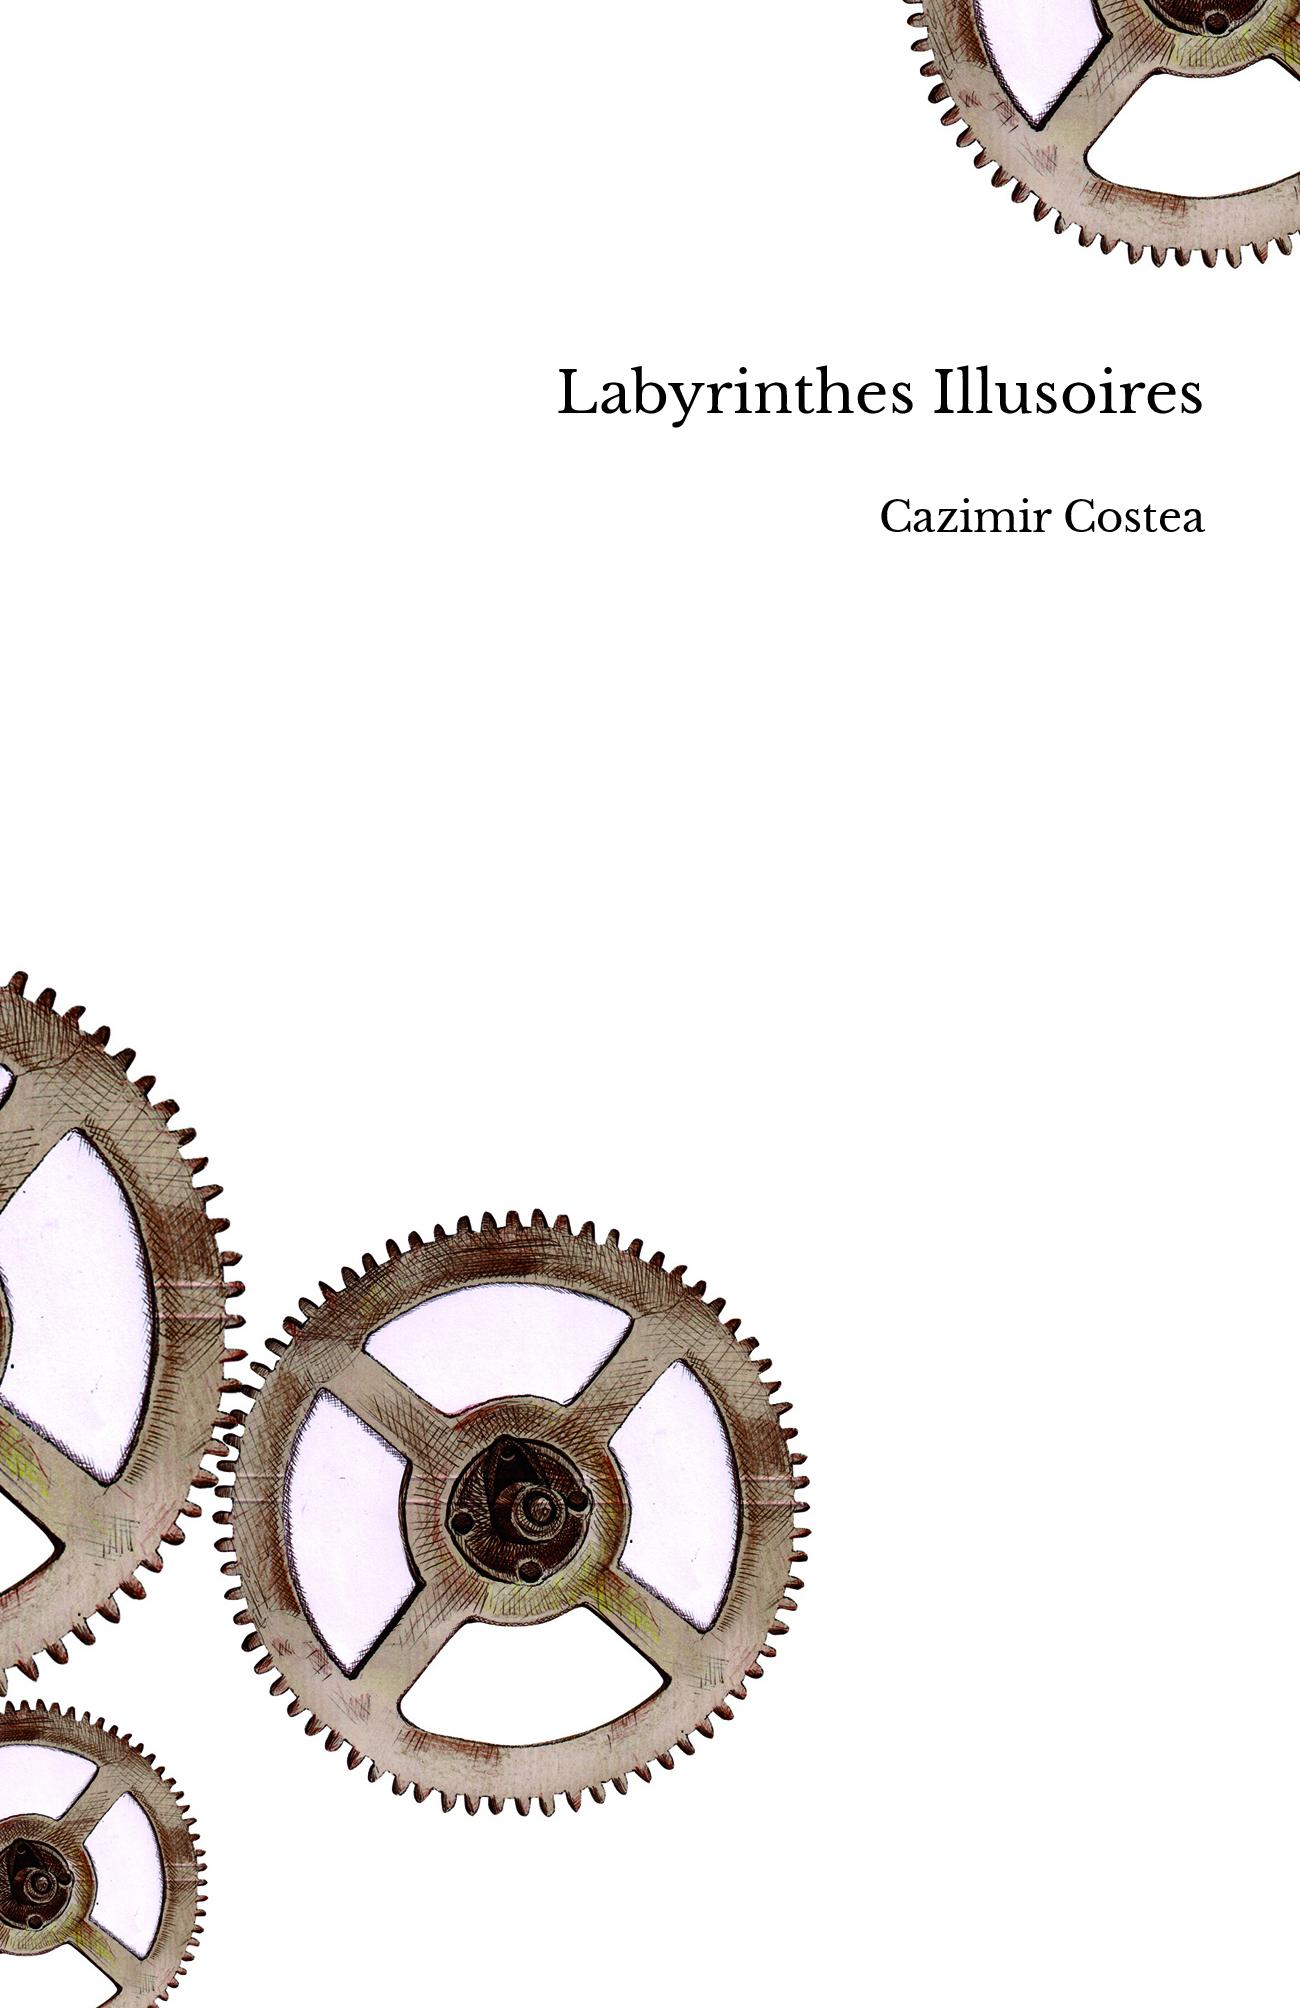 Labyrinthes Illusoires